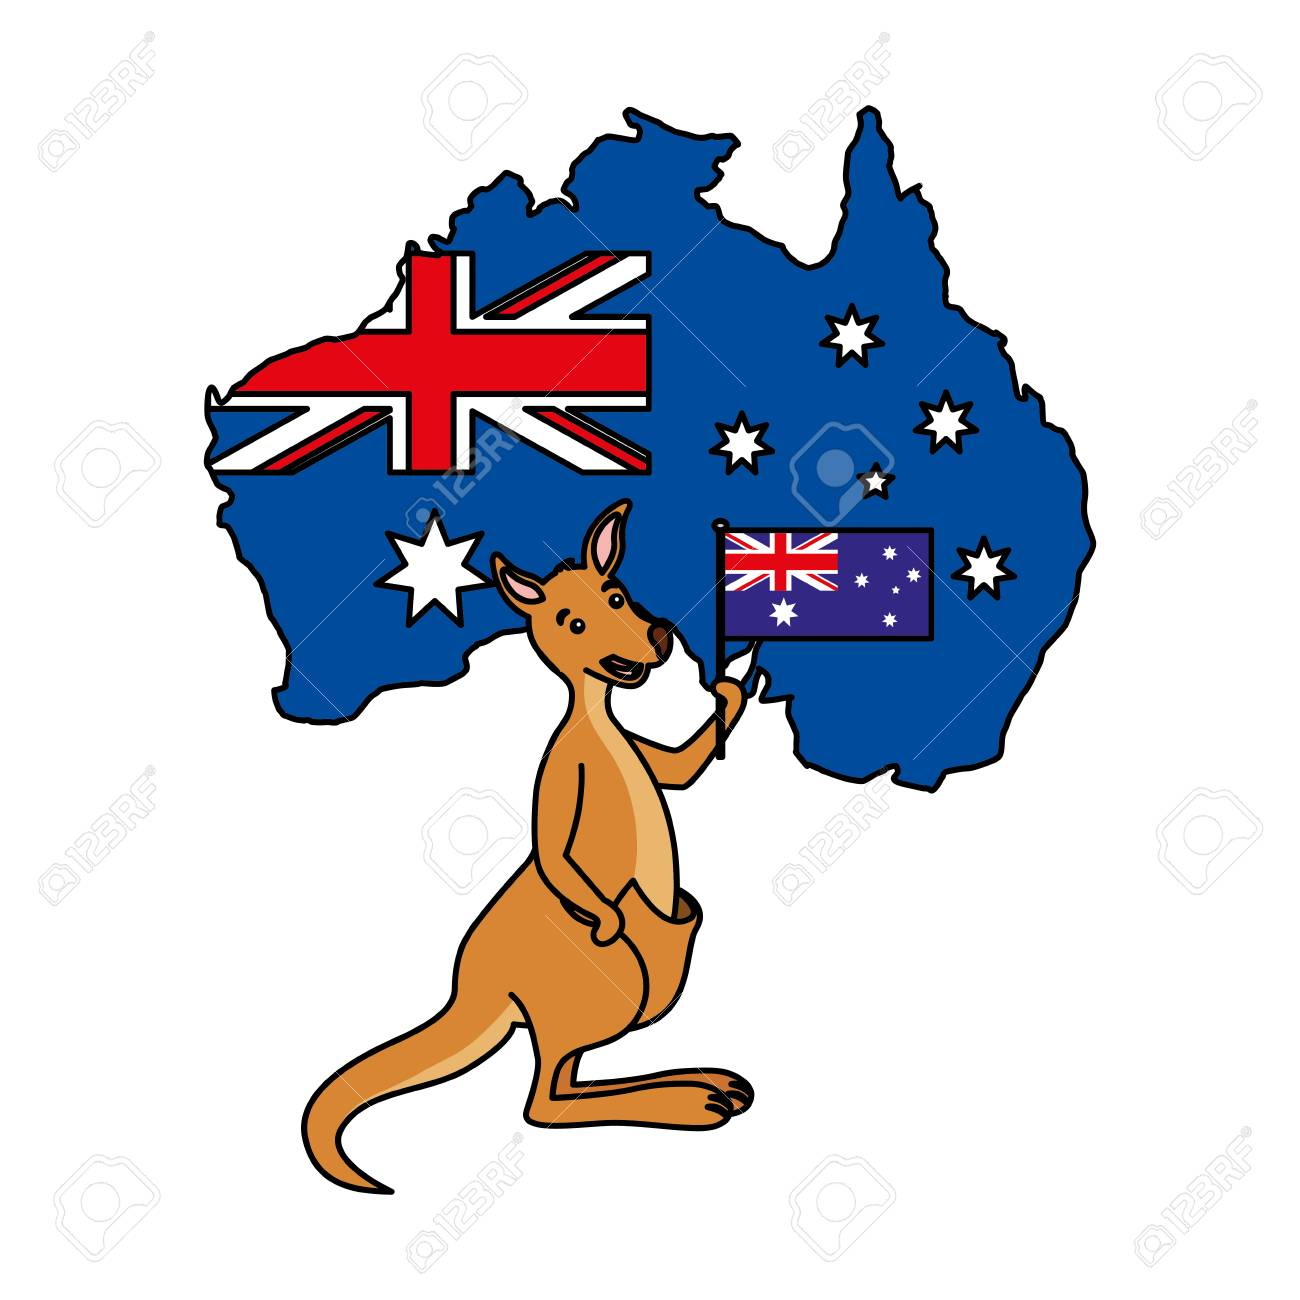 kangaroo with hat australian flag map vector illustration.